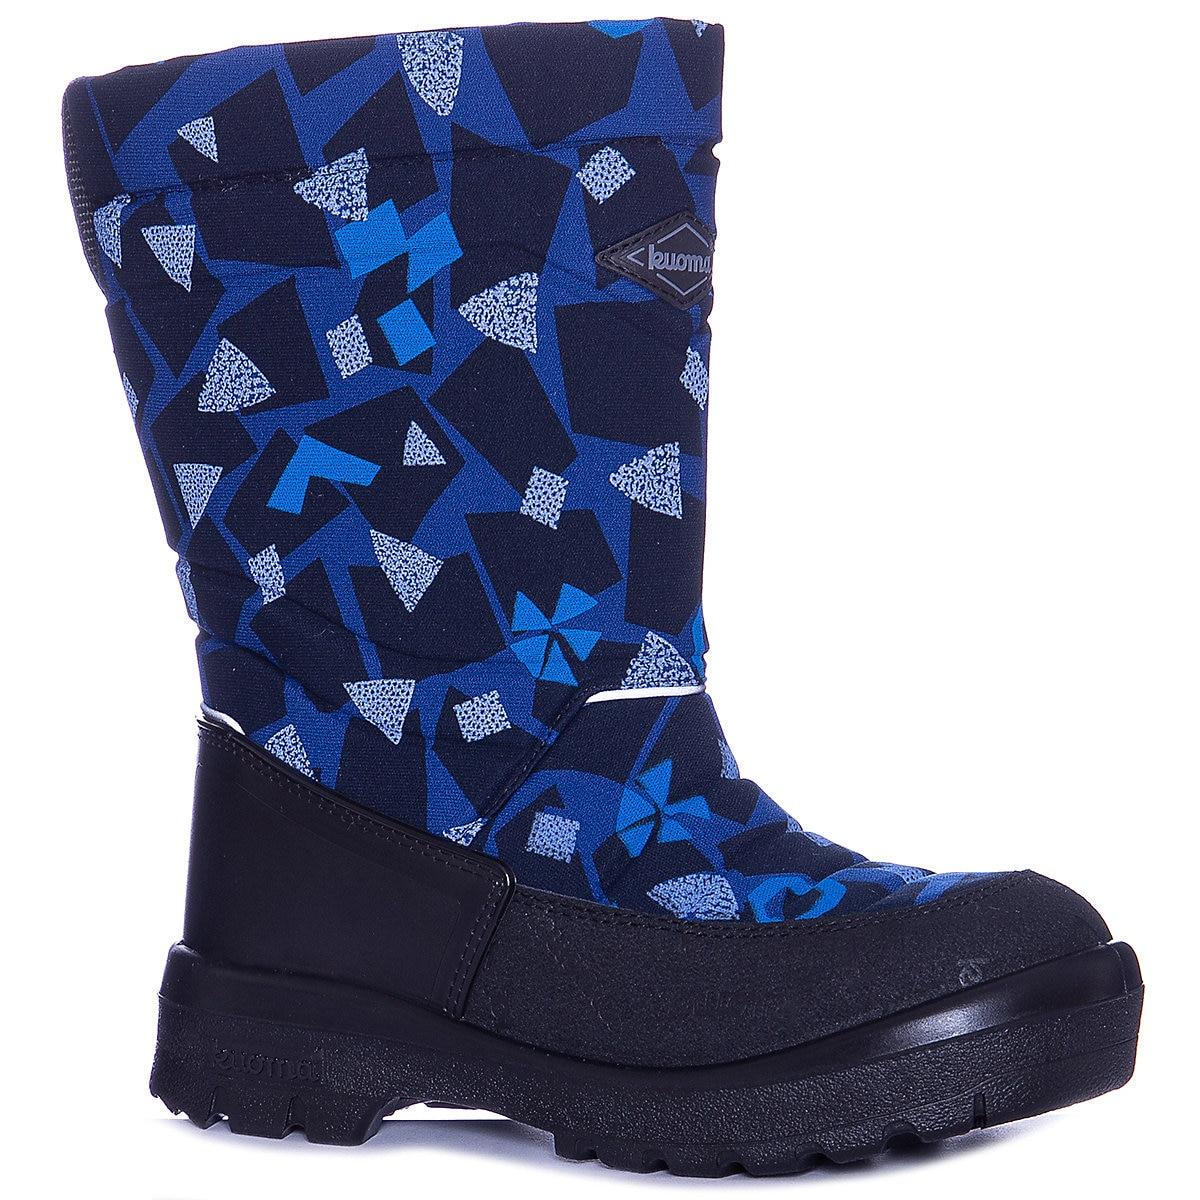 Boots KUOMA for boys 9491177 Valenki Uggi Winter shoes Children Kids MTpromo reima boots 8624989 for boys winter boy children shoes